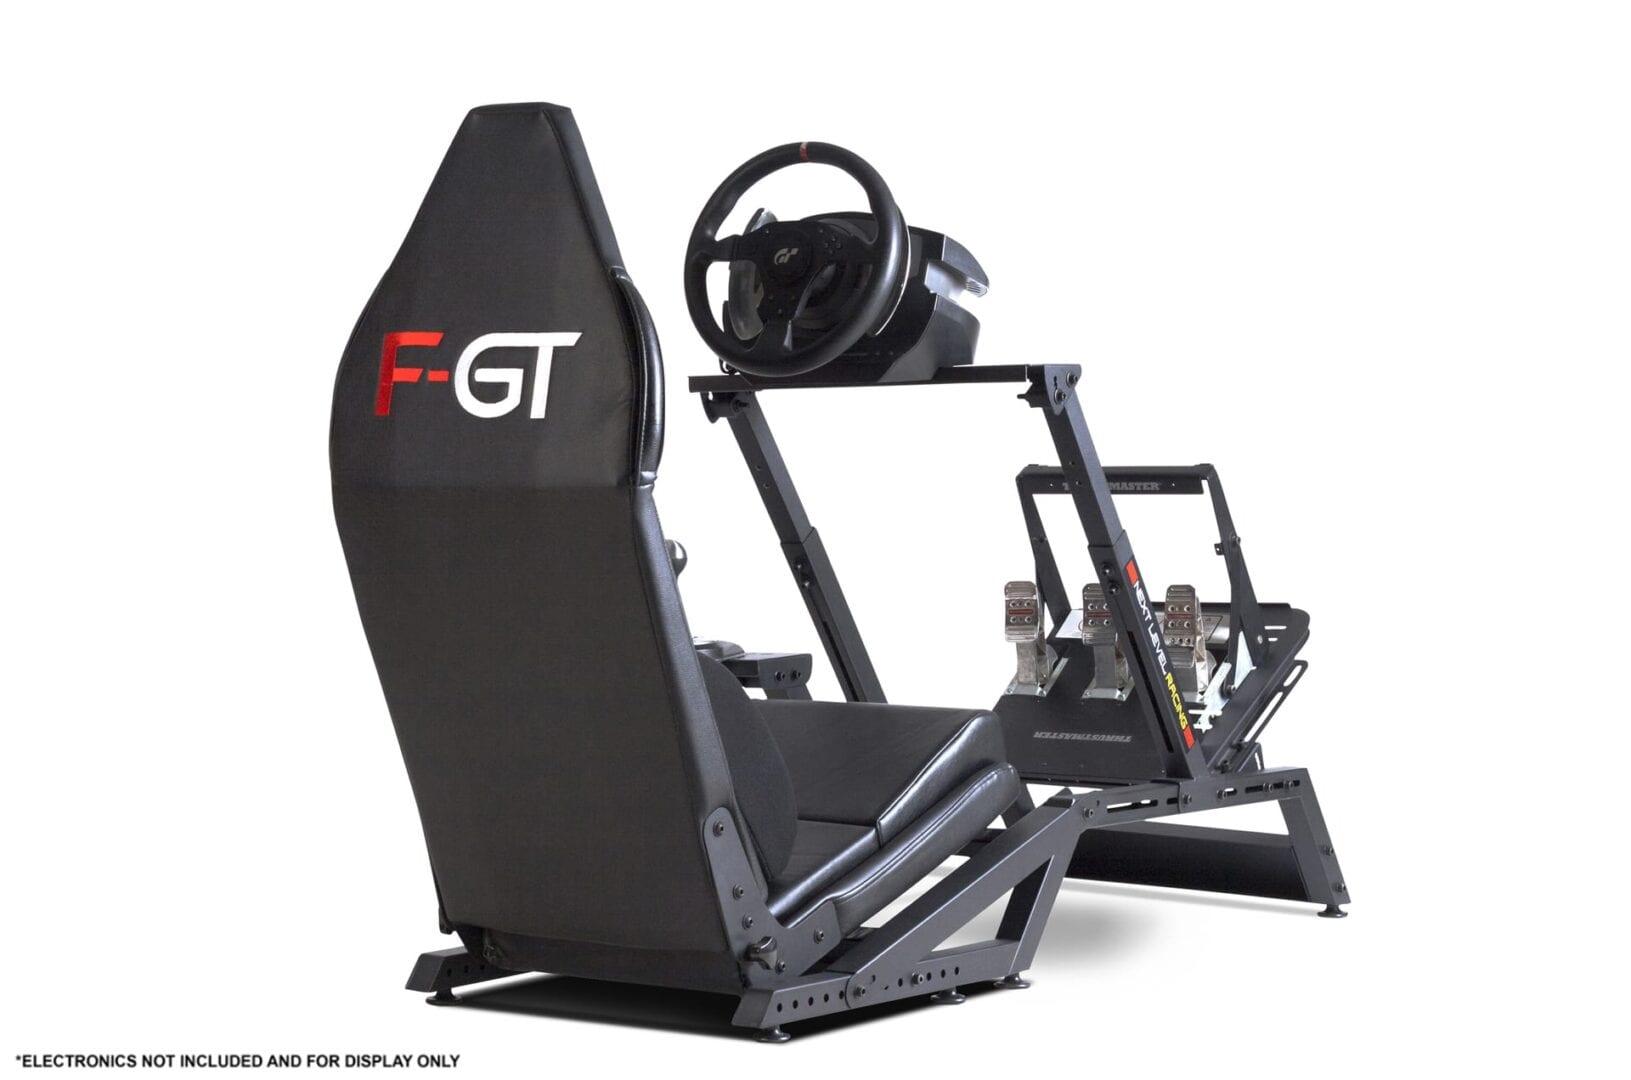 Next Level Racing F-GT Matte Black Simulator Cockpit 111